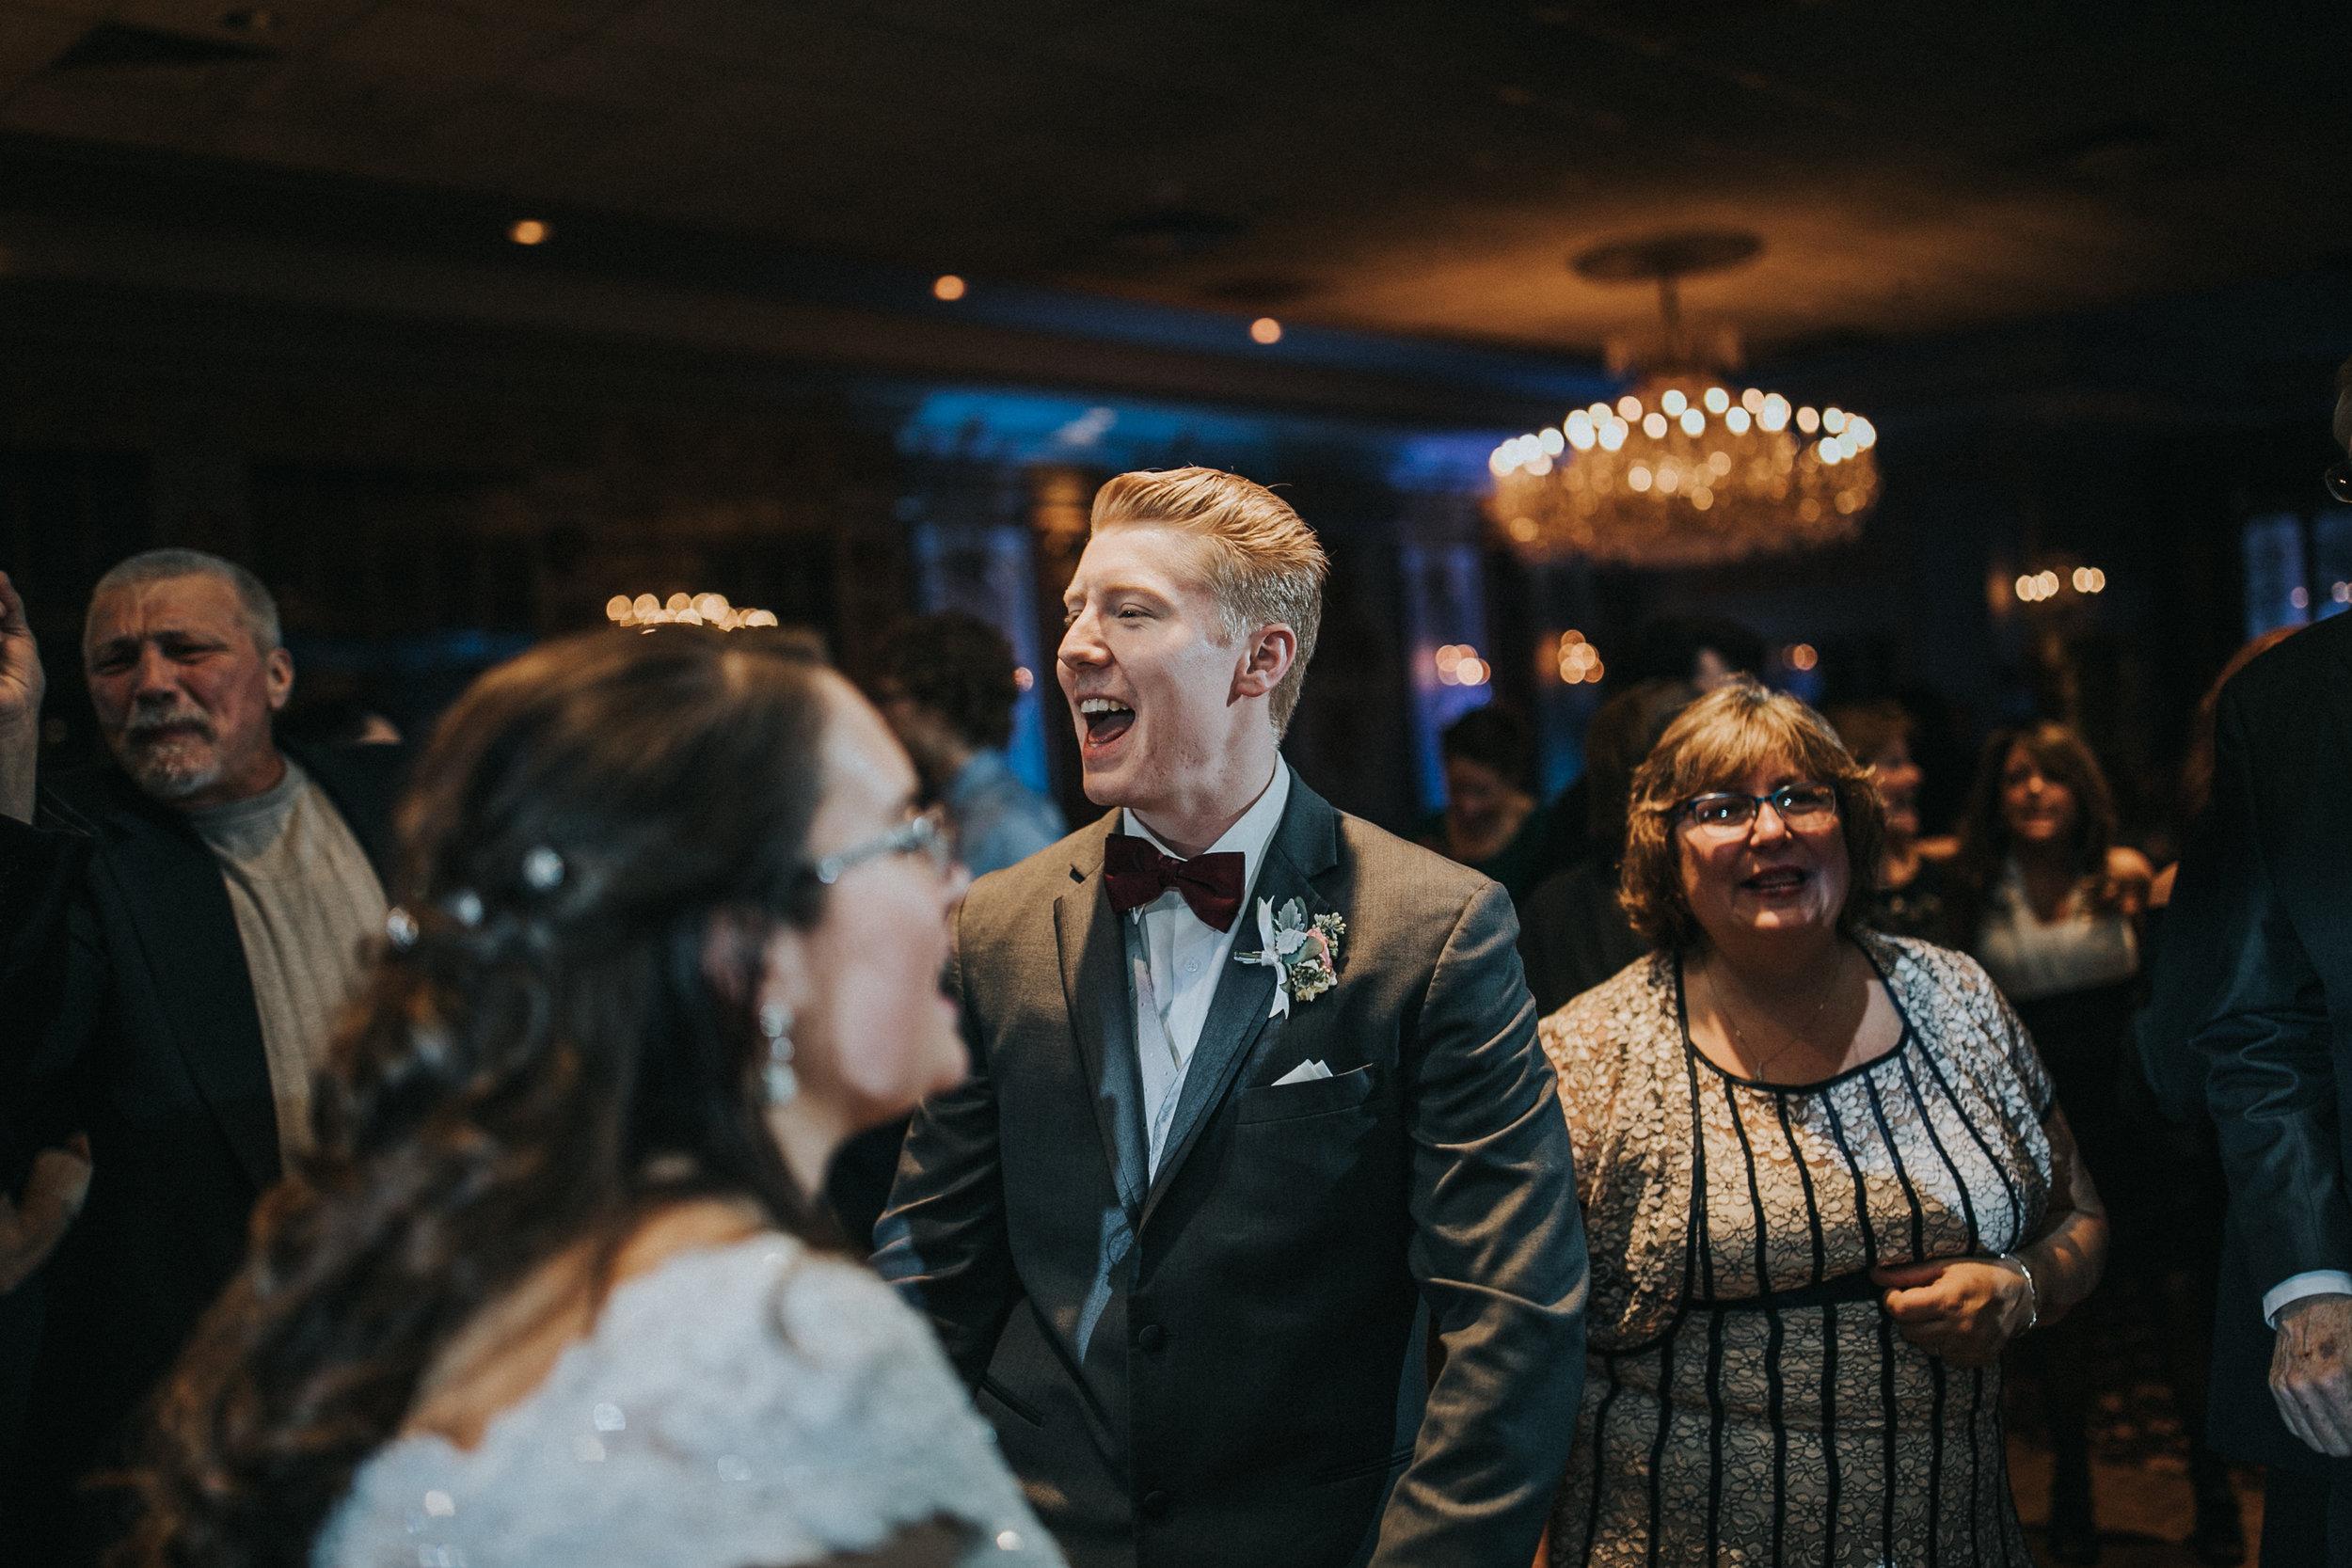 New-Jersey-Wedding-Photography-Fishers-Tudor-House-JennaLynnPhotography-Reception-Kathleen&Eddie-128.jpg